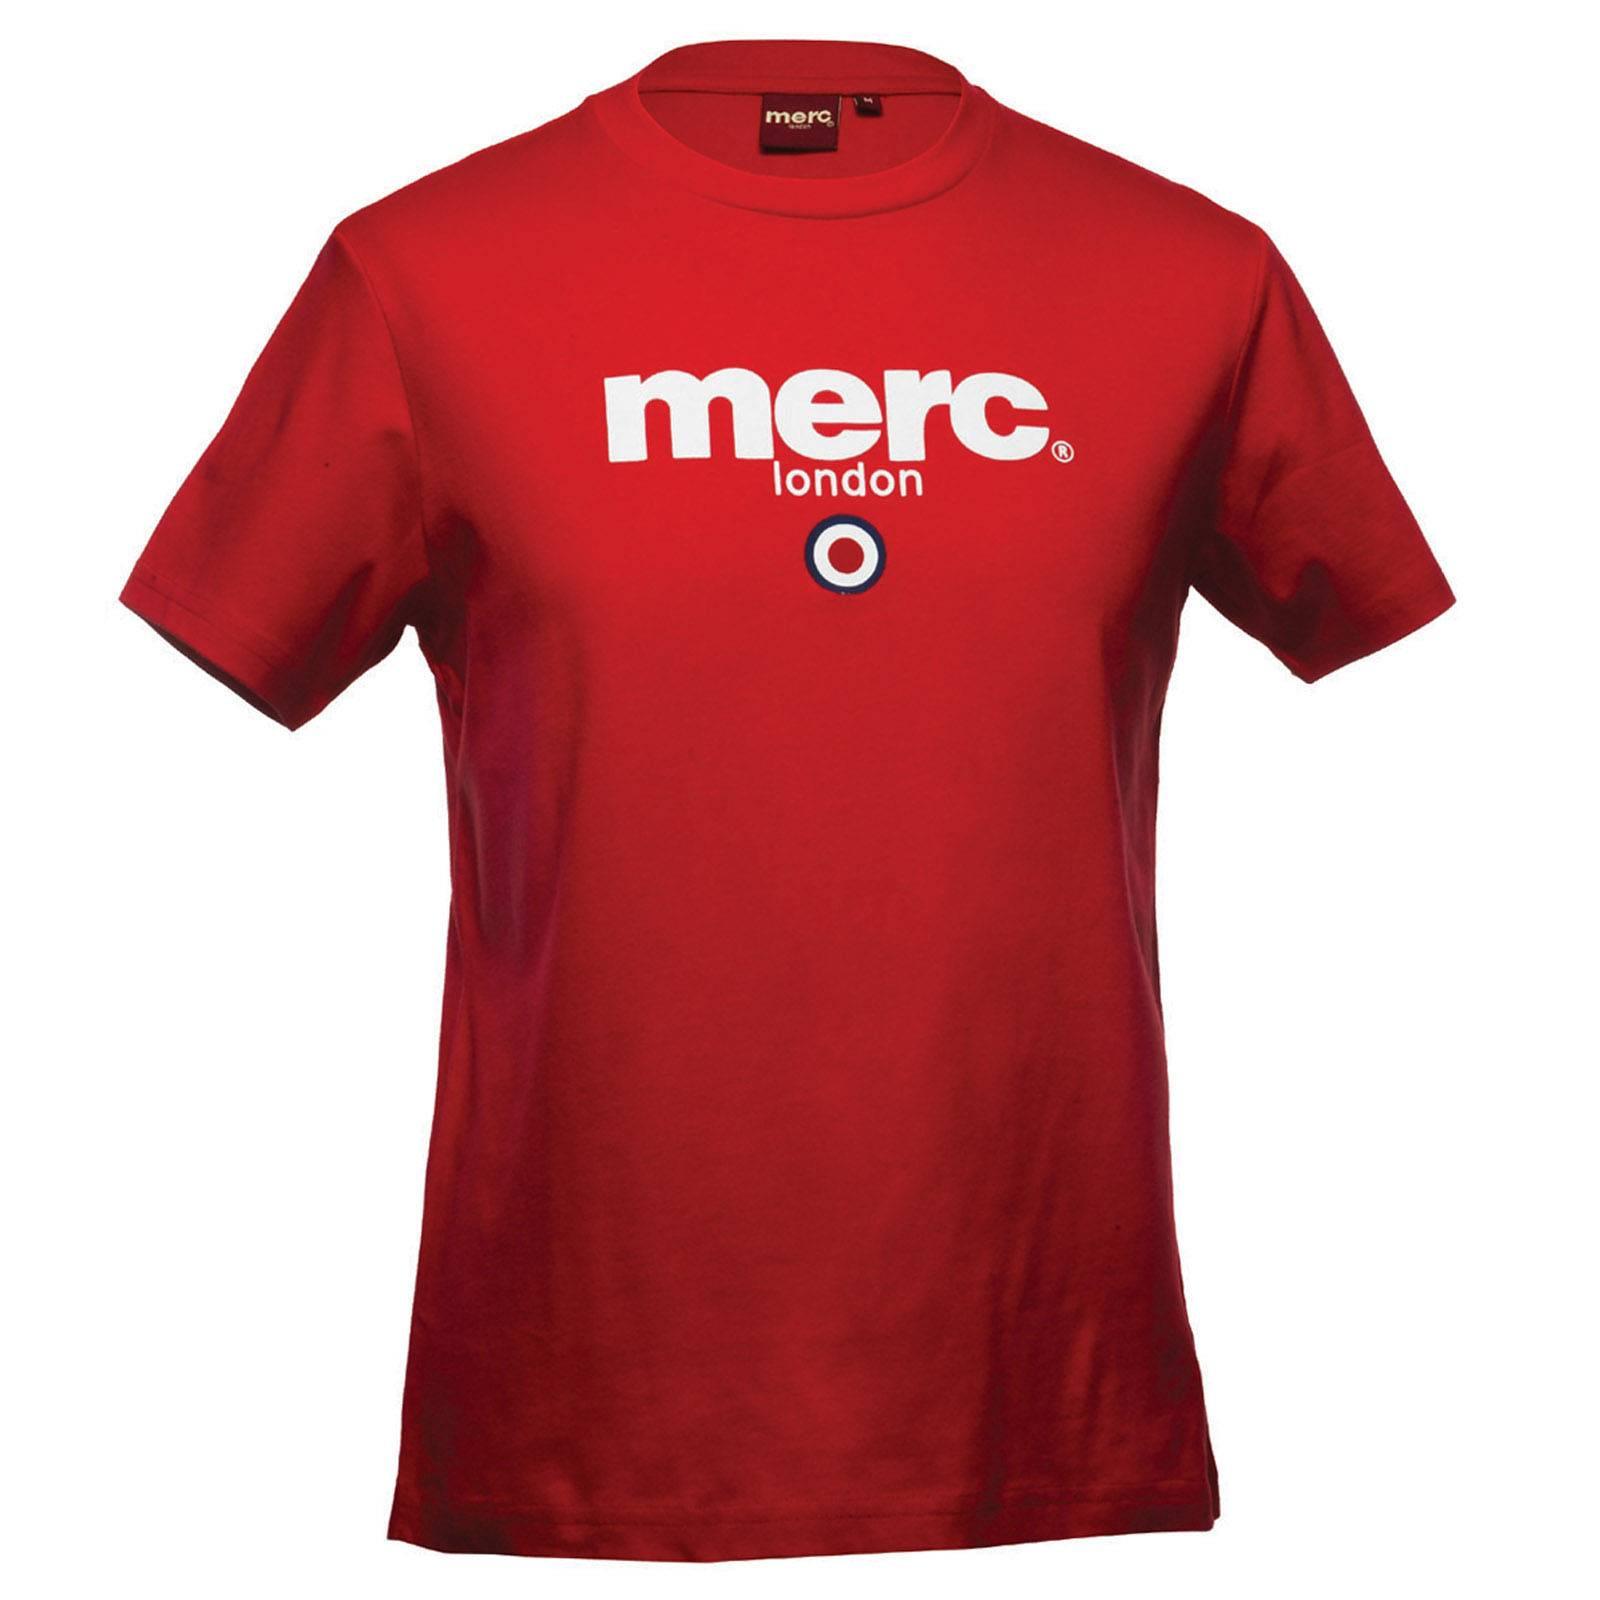 Футболка BrightonCORE<br><br><br>Артикул: 1704136<br>Материал: 100% Хлопок<br>Цвет: красный<br>Пол: Мужской